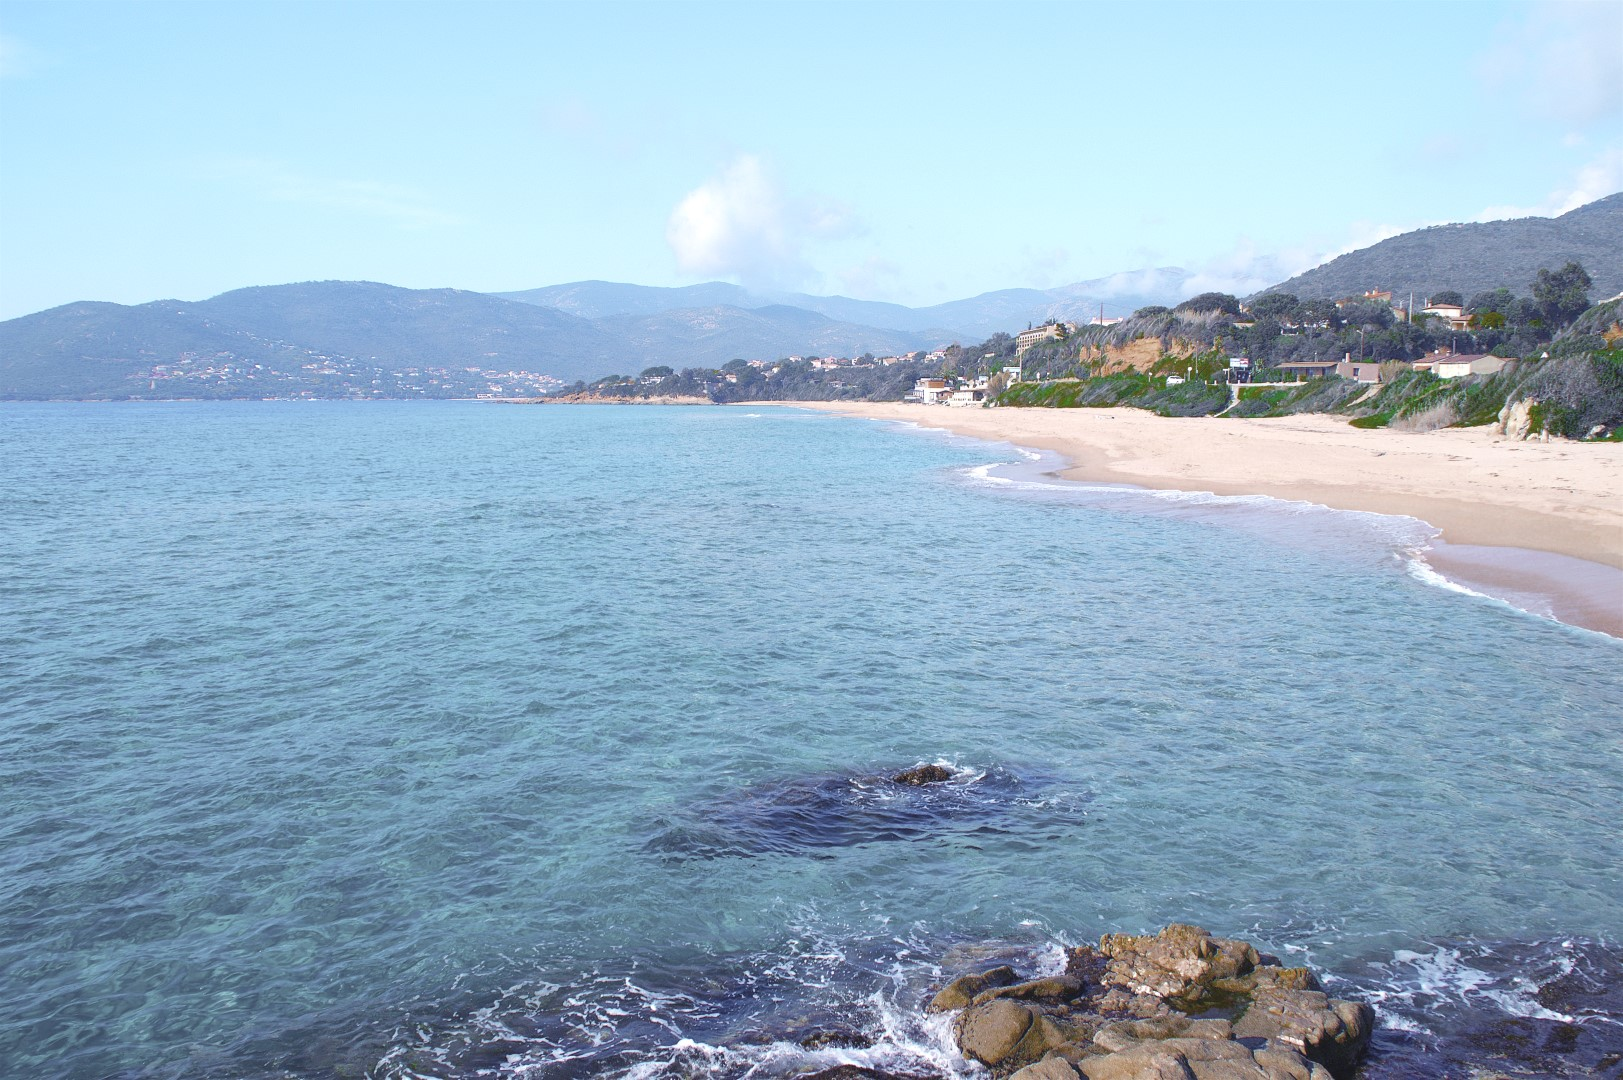 2017-01_Goodbye_Bonifacio - DN20_Corsica_02-Large.jpg